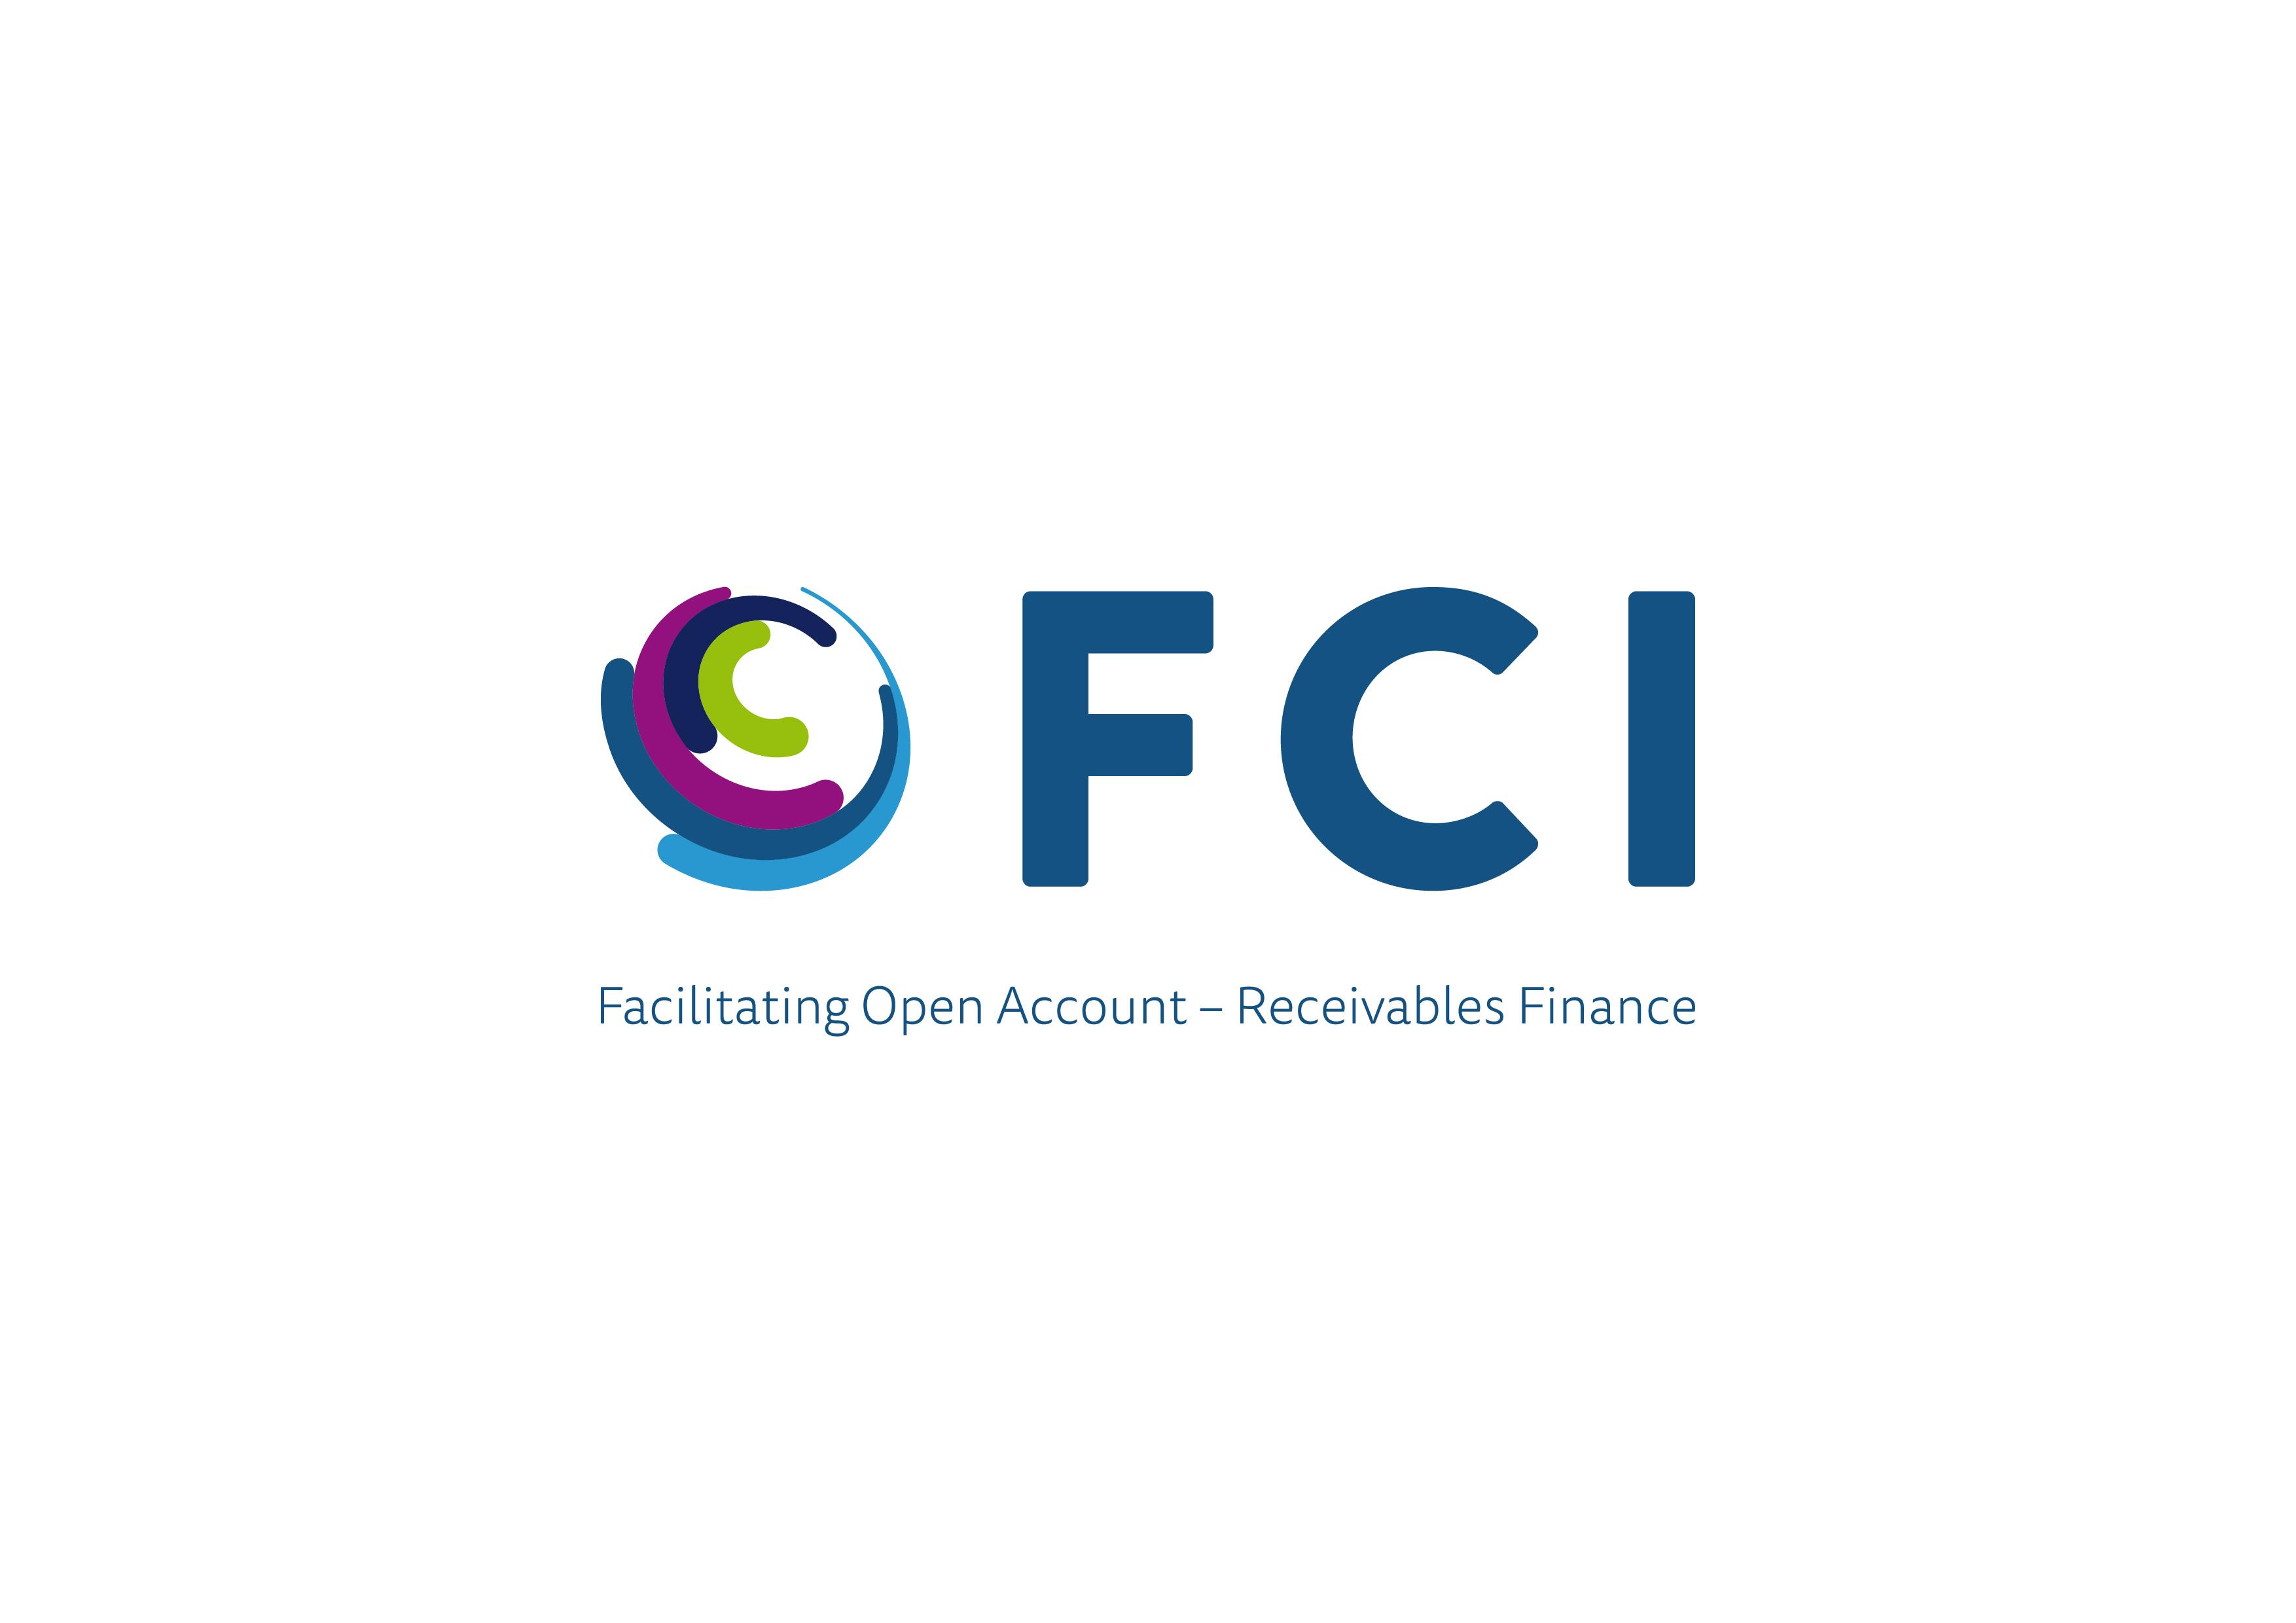 logo for Factors Chain International